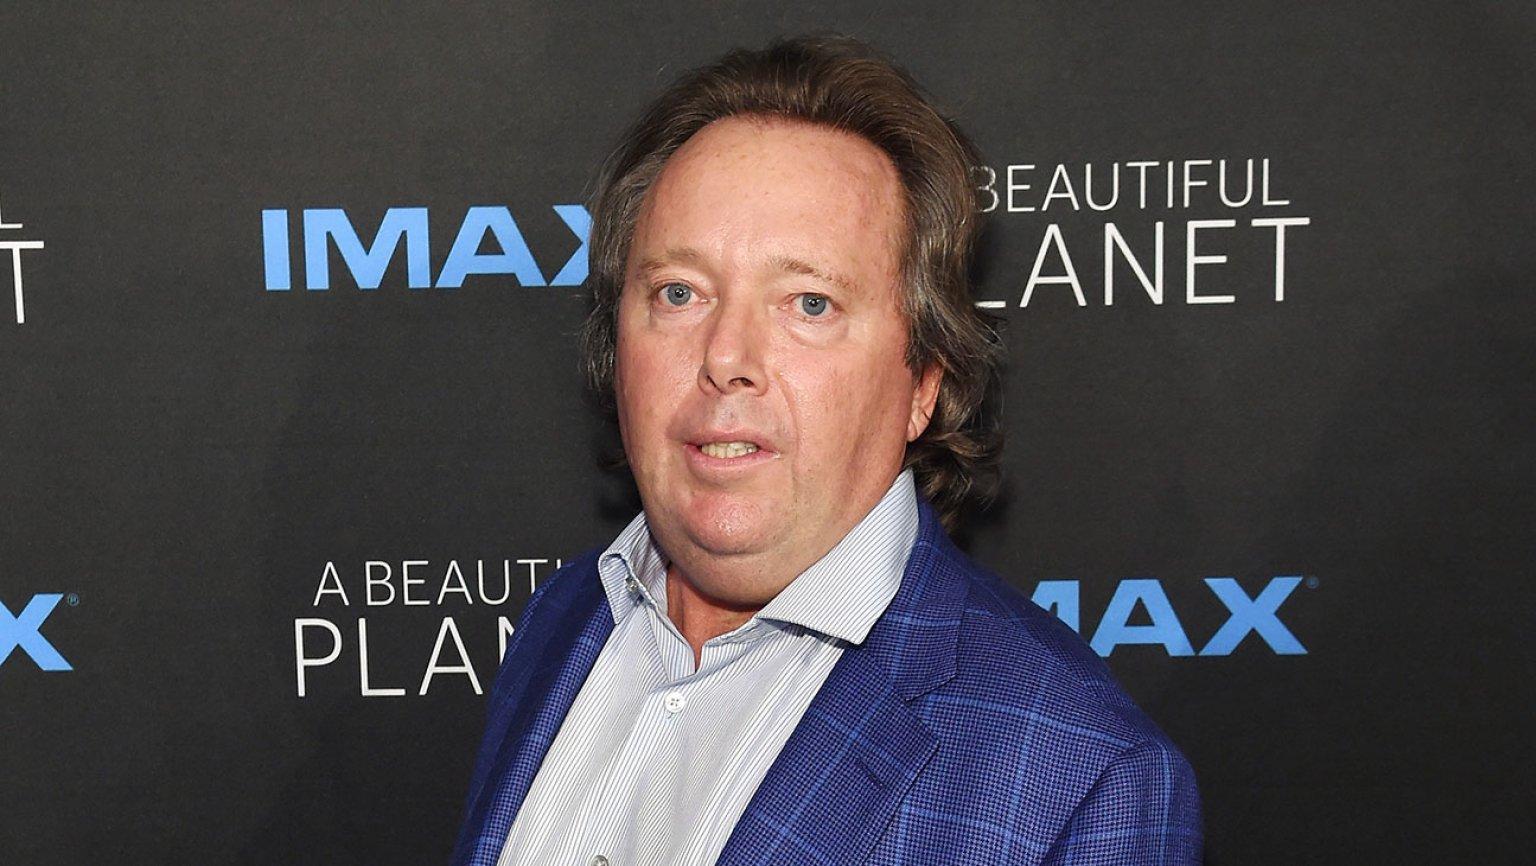 IMAX首席執行官理查德·格爾豐德。